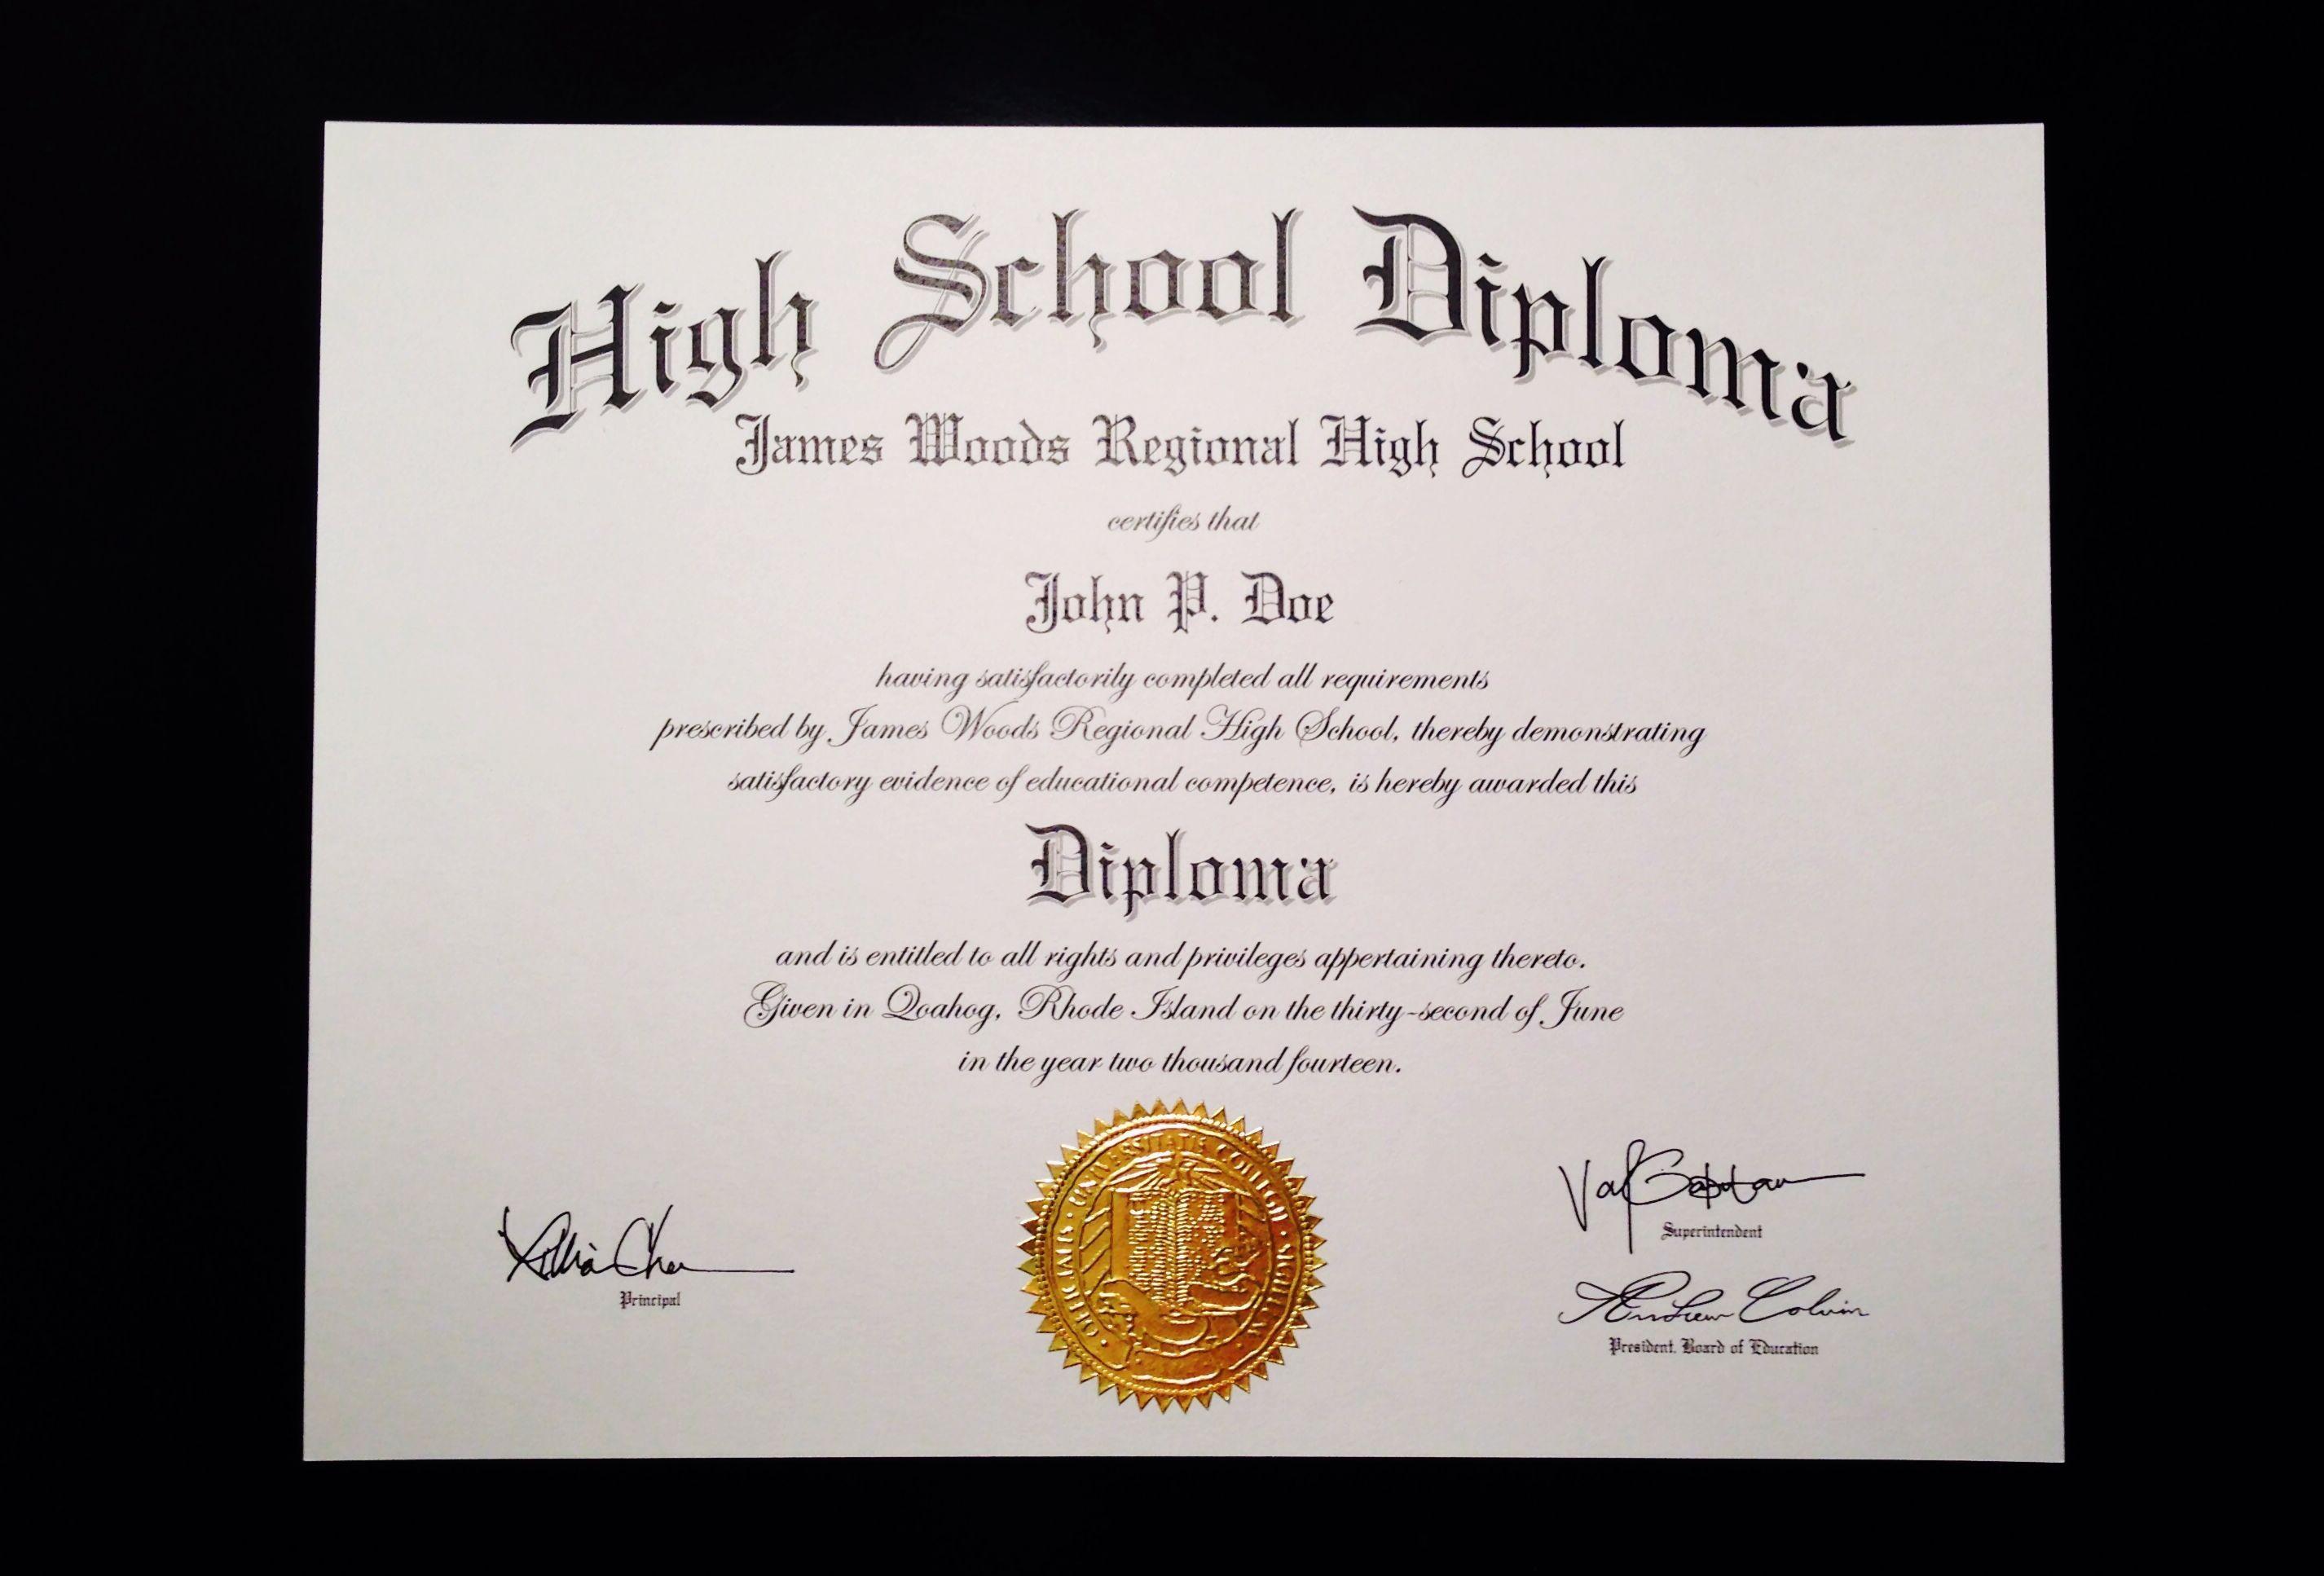 002 Incredible Free High School Diploma Template Resolution  Templates Print Out Editable PrintableFull